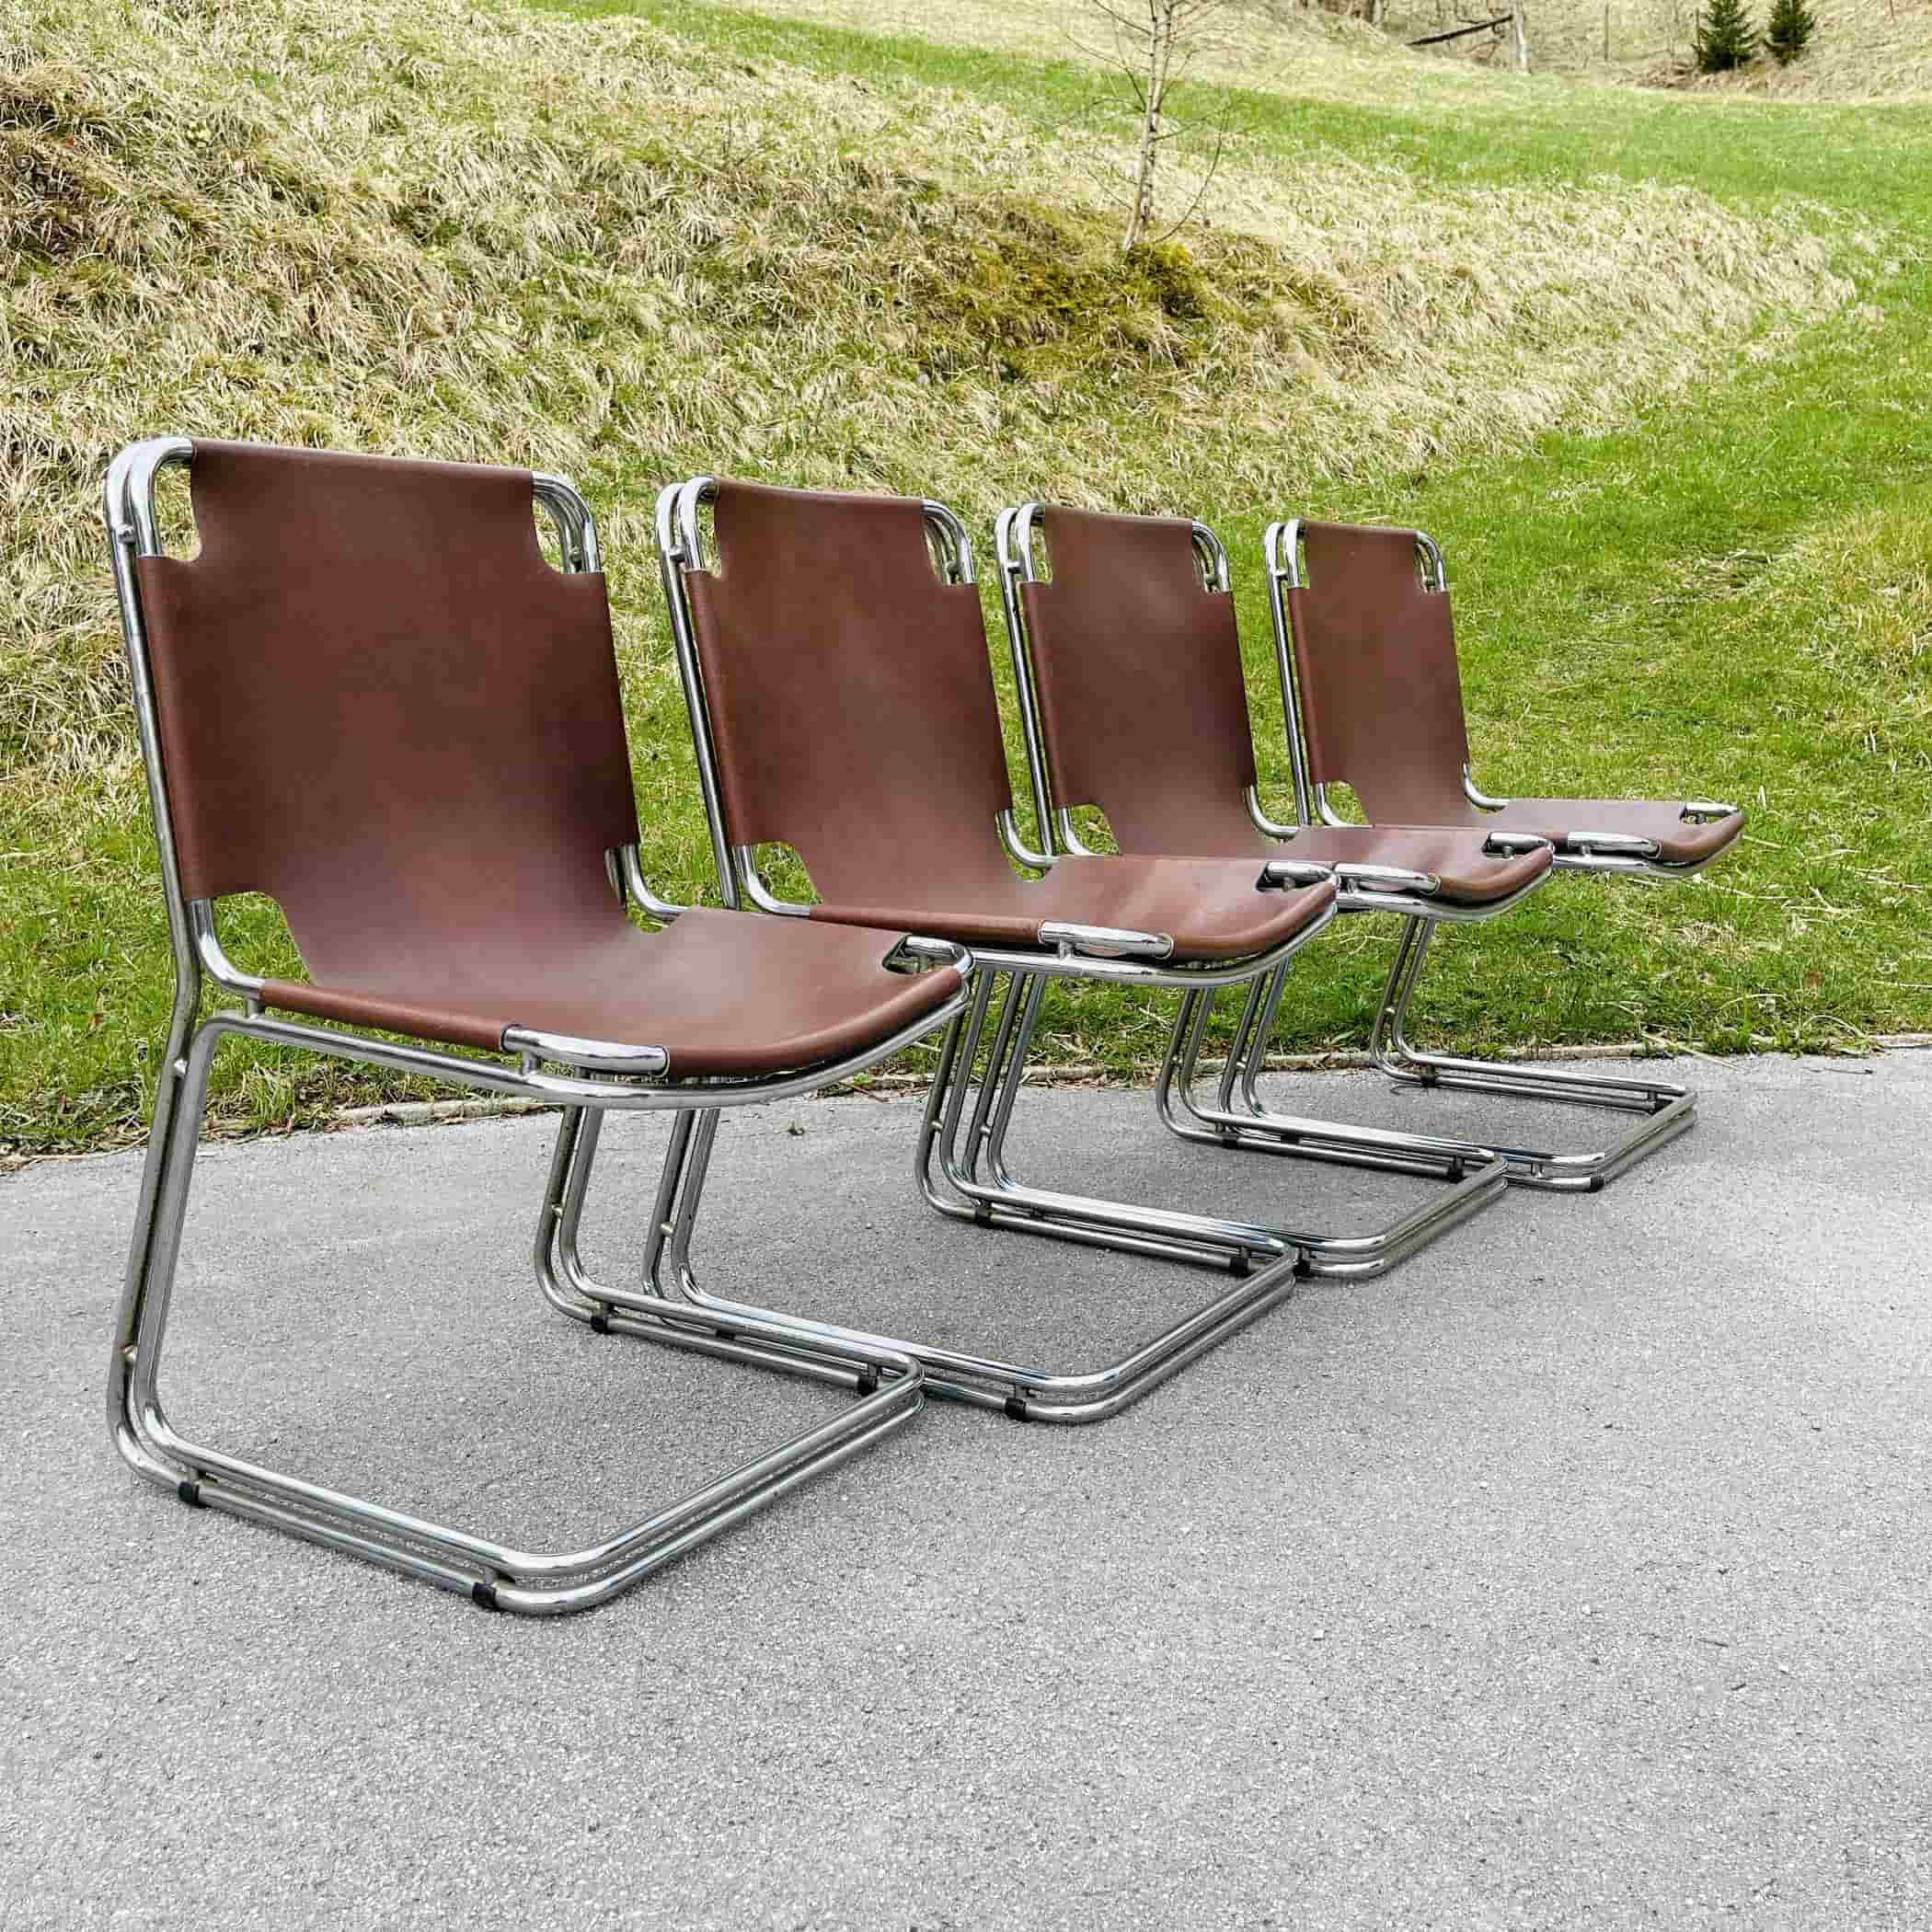 Set of 4 mid-century chrome dining chairs Bologna Italy 1960s Italian modern Gastone Rinaldi Style